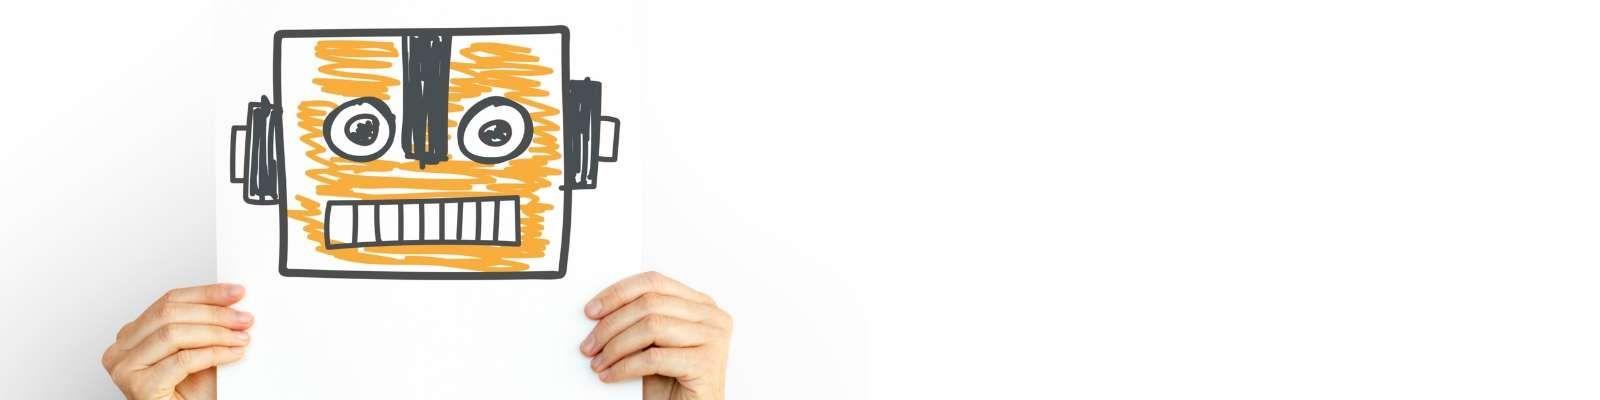 como elegir herramienta email marketing